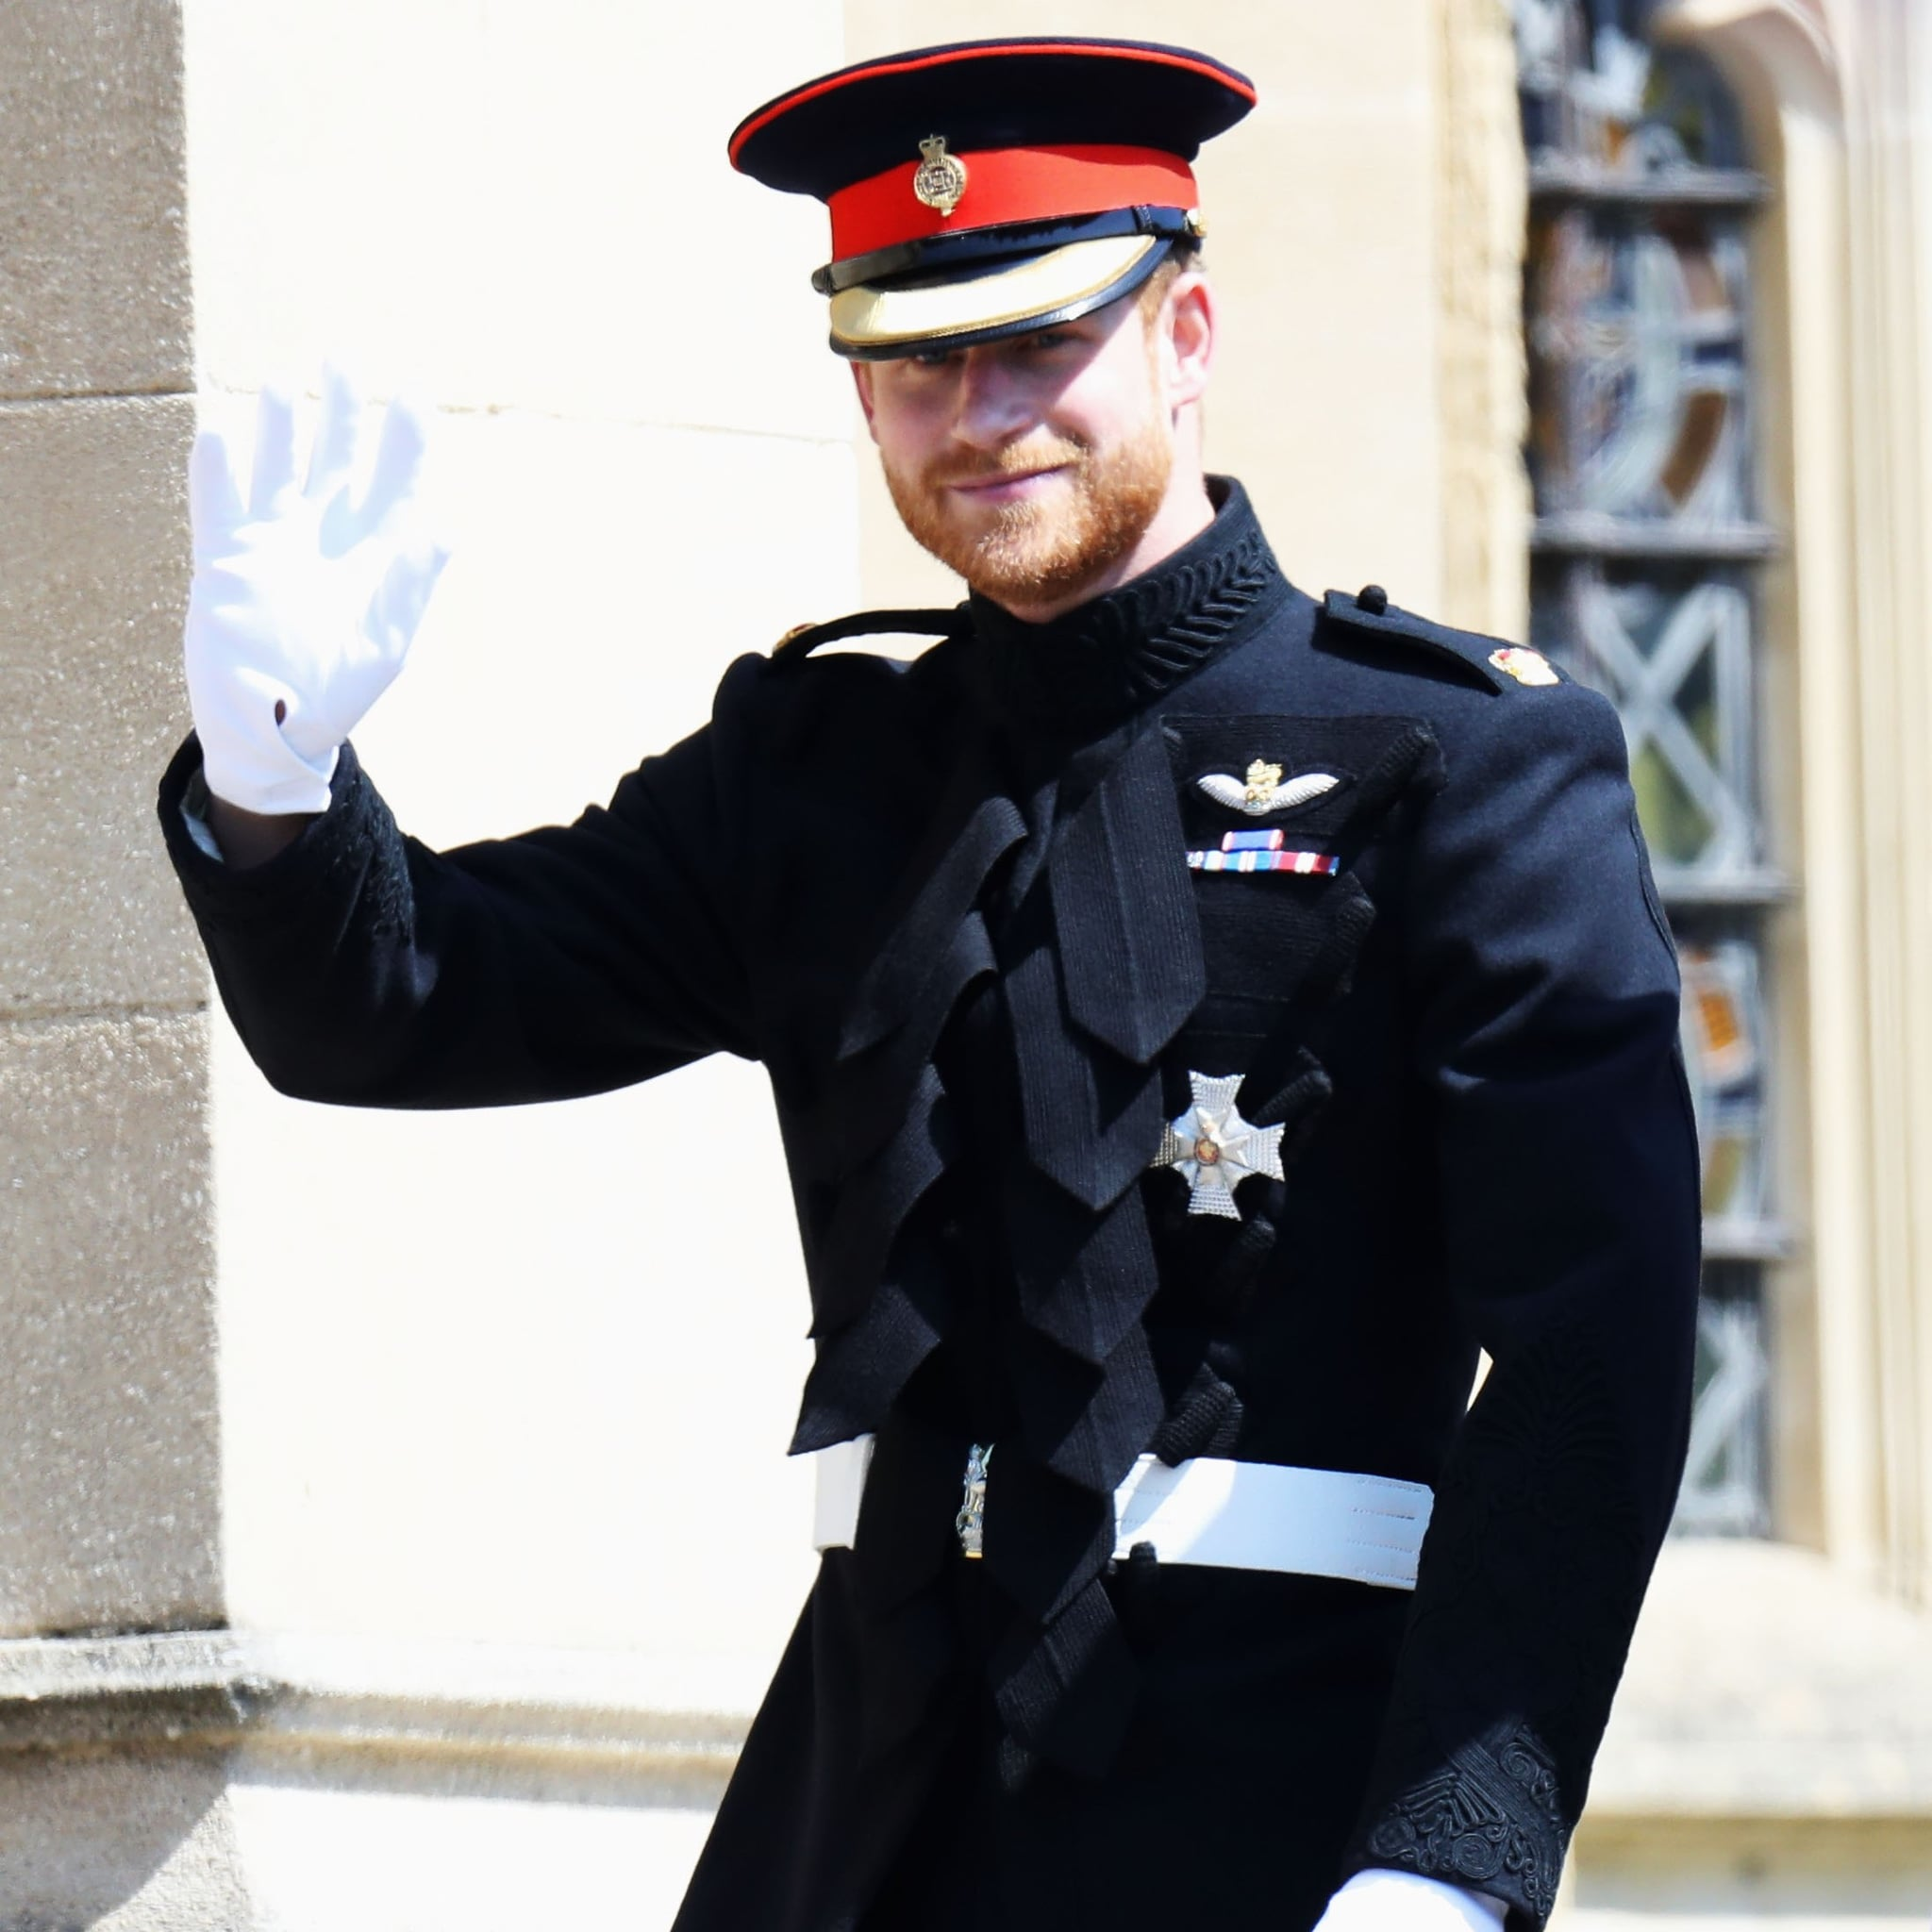 prince harry royal wedding outfit popsugar fashion prince harry royal wedding outfit